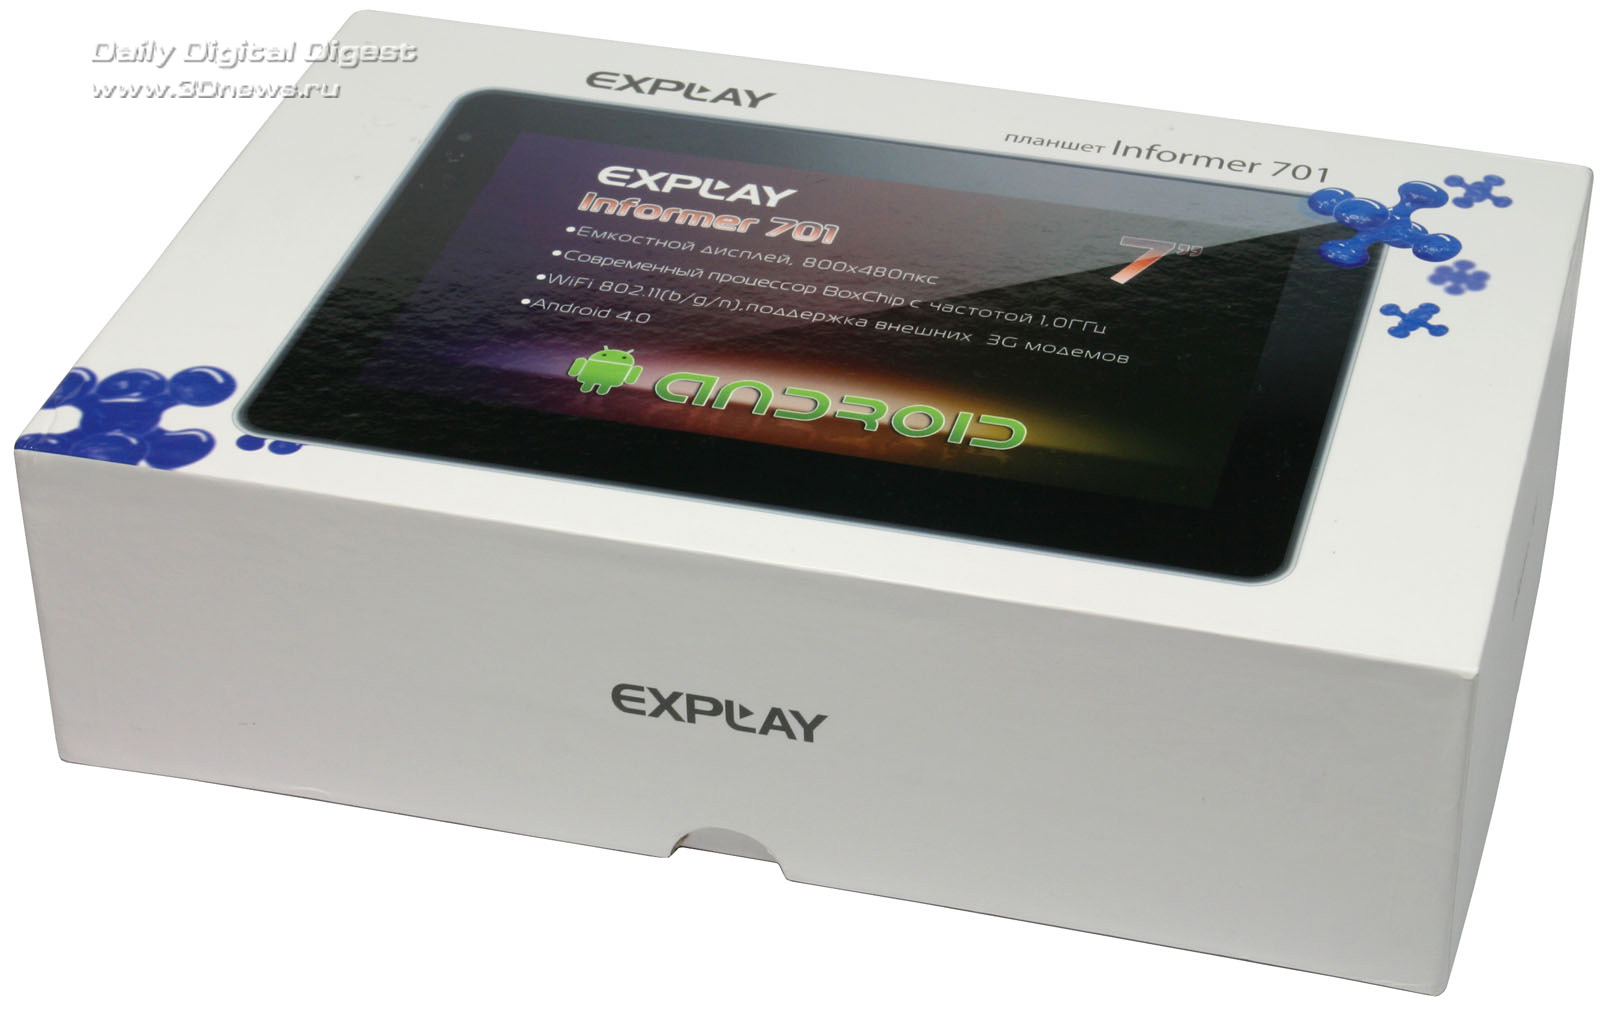 Обзор планшета Explay Informer 701 на Андроид.